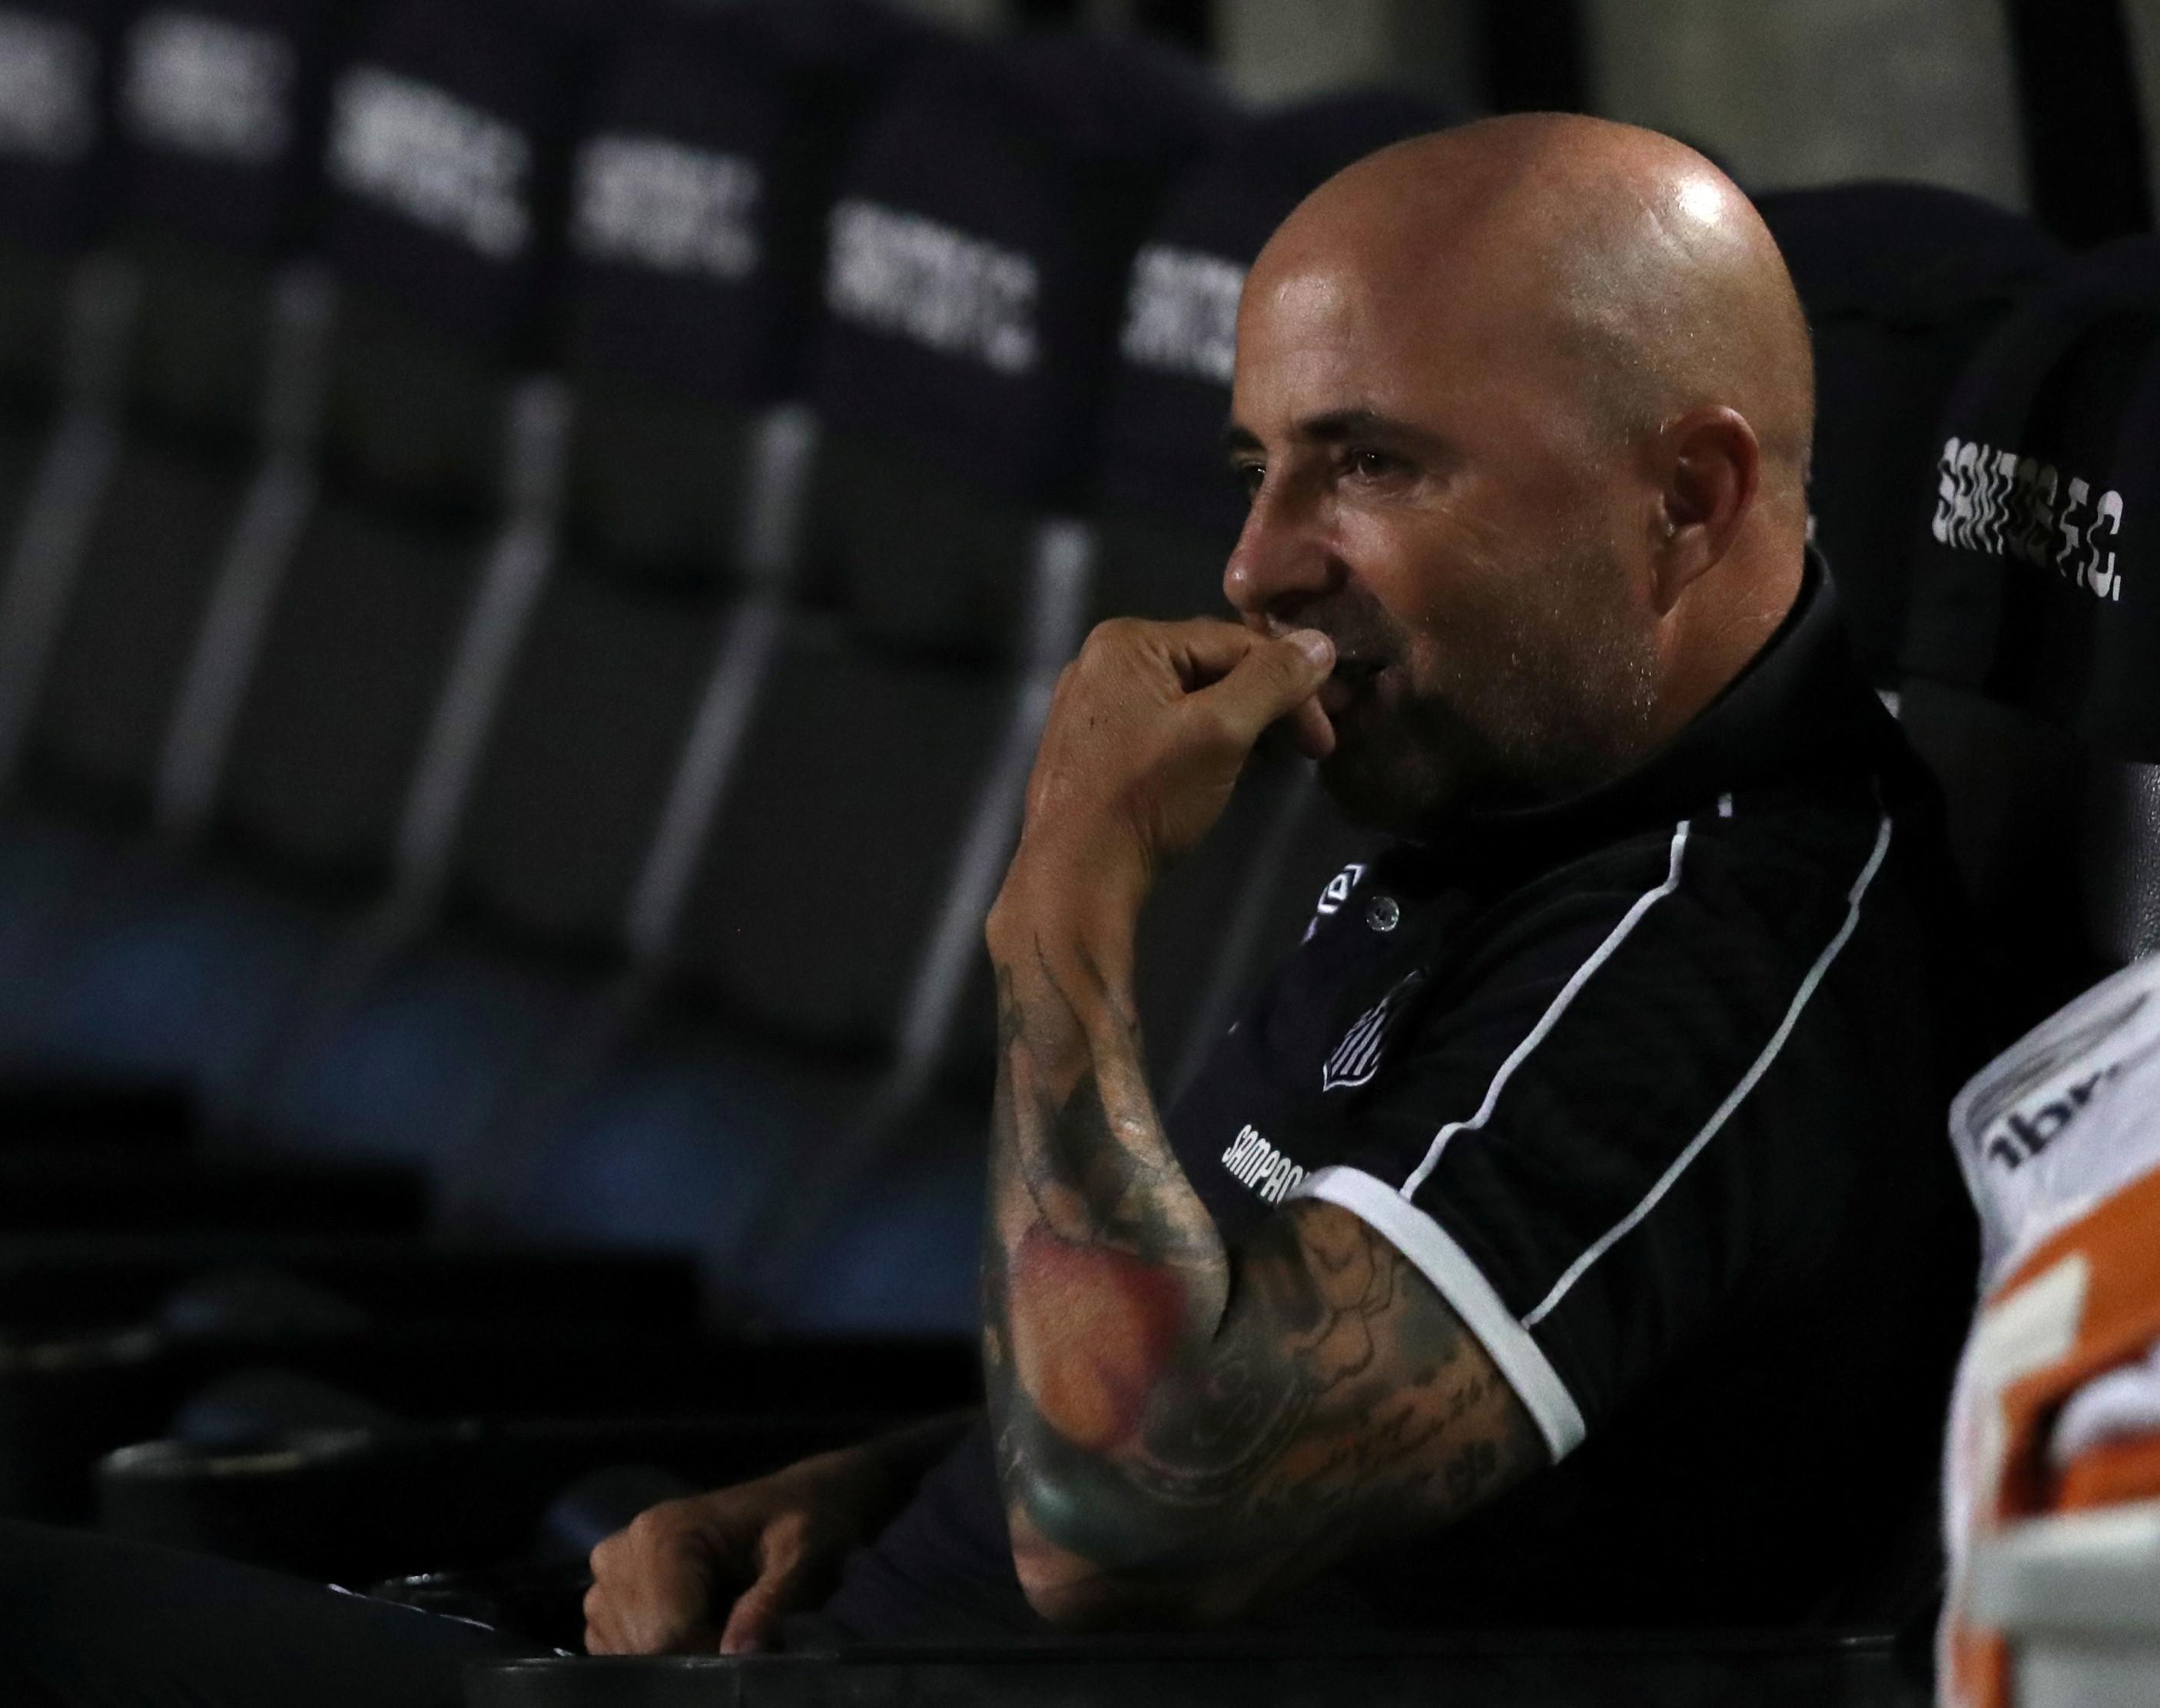 Sampaoli devolve ordenado para plantel do Santos poder receber